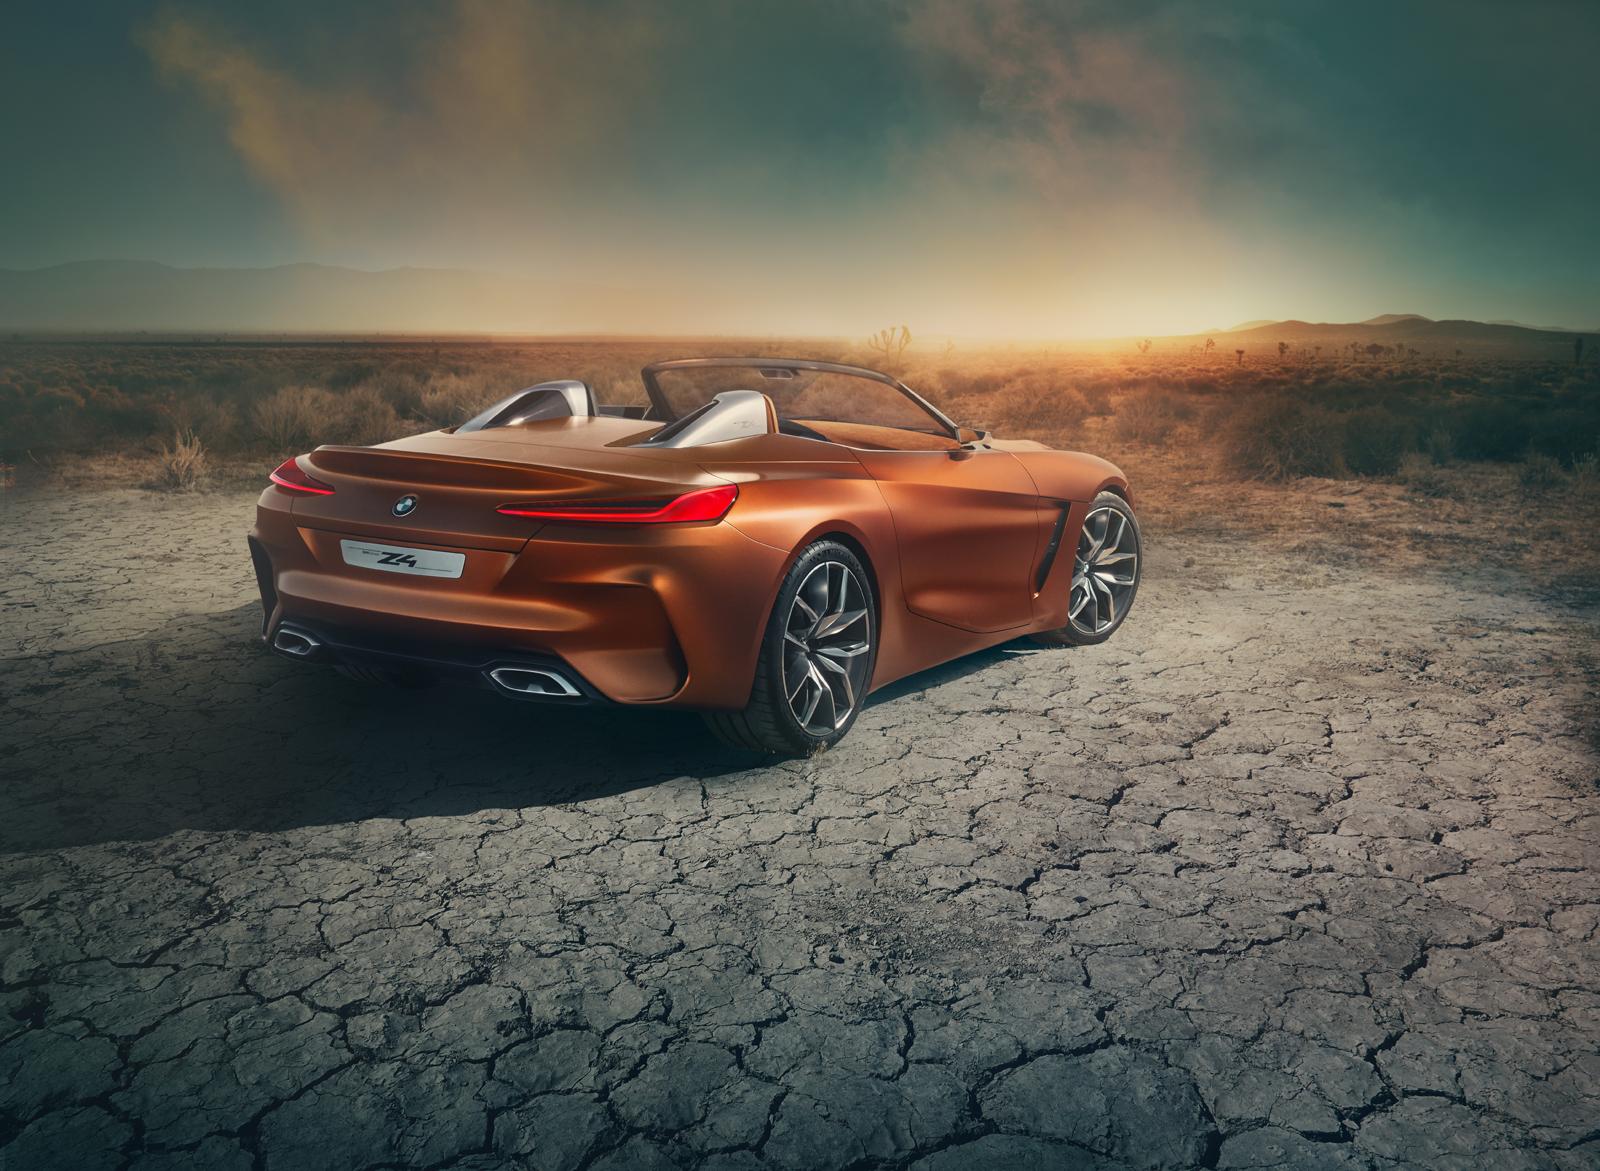 BMW_DCC070_23.jpg